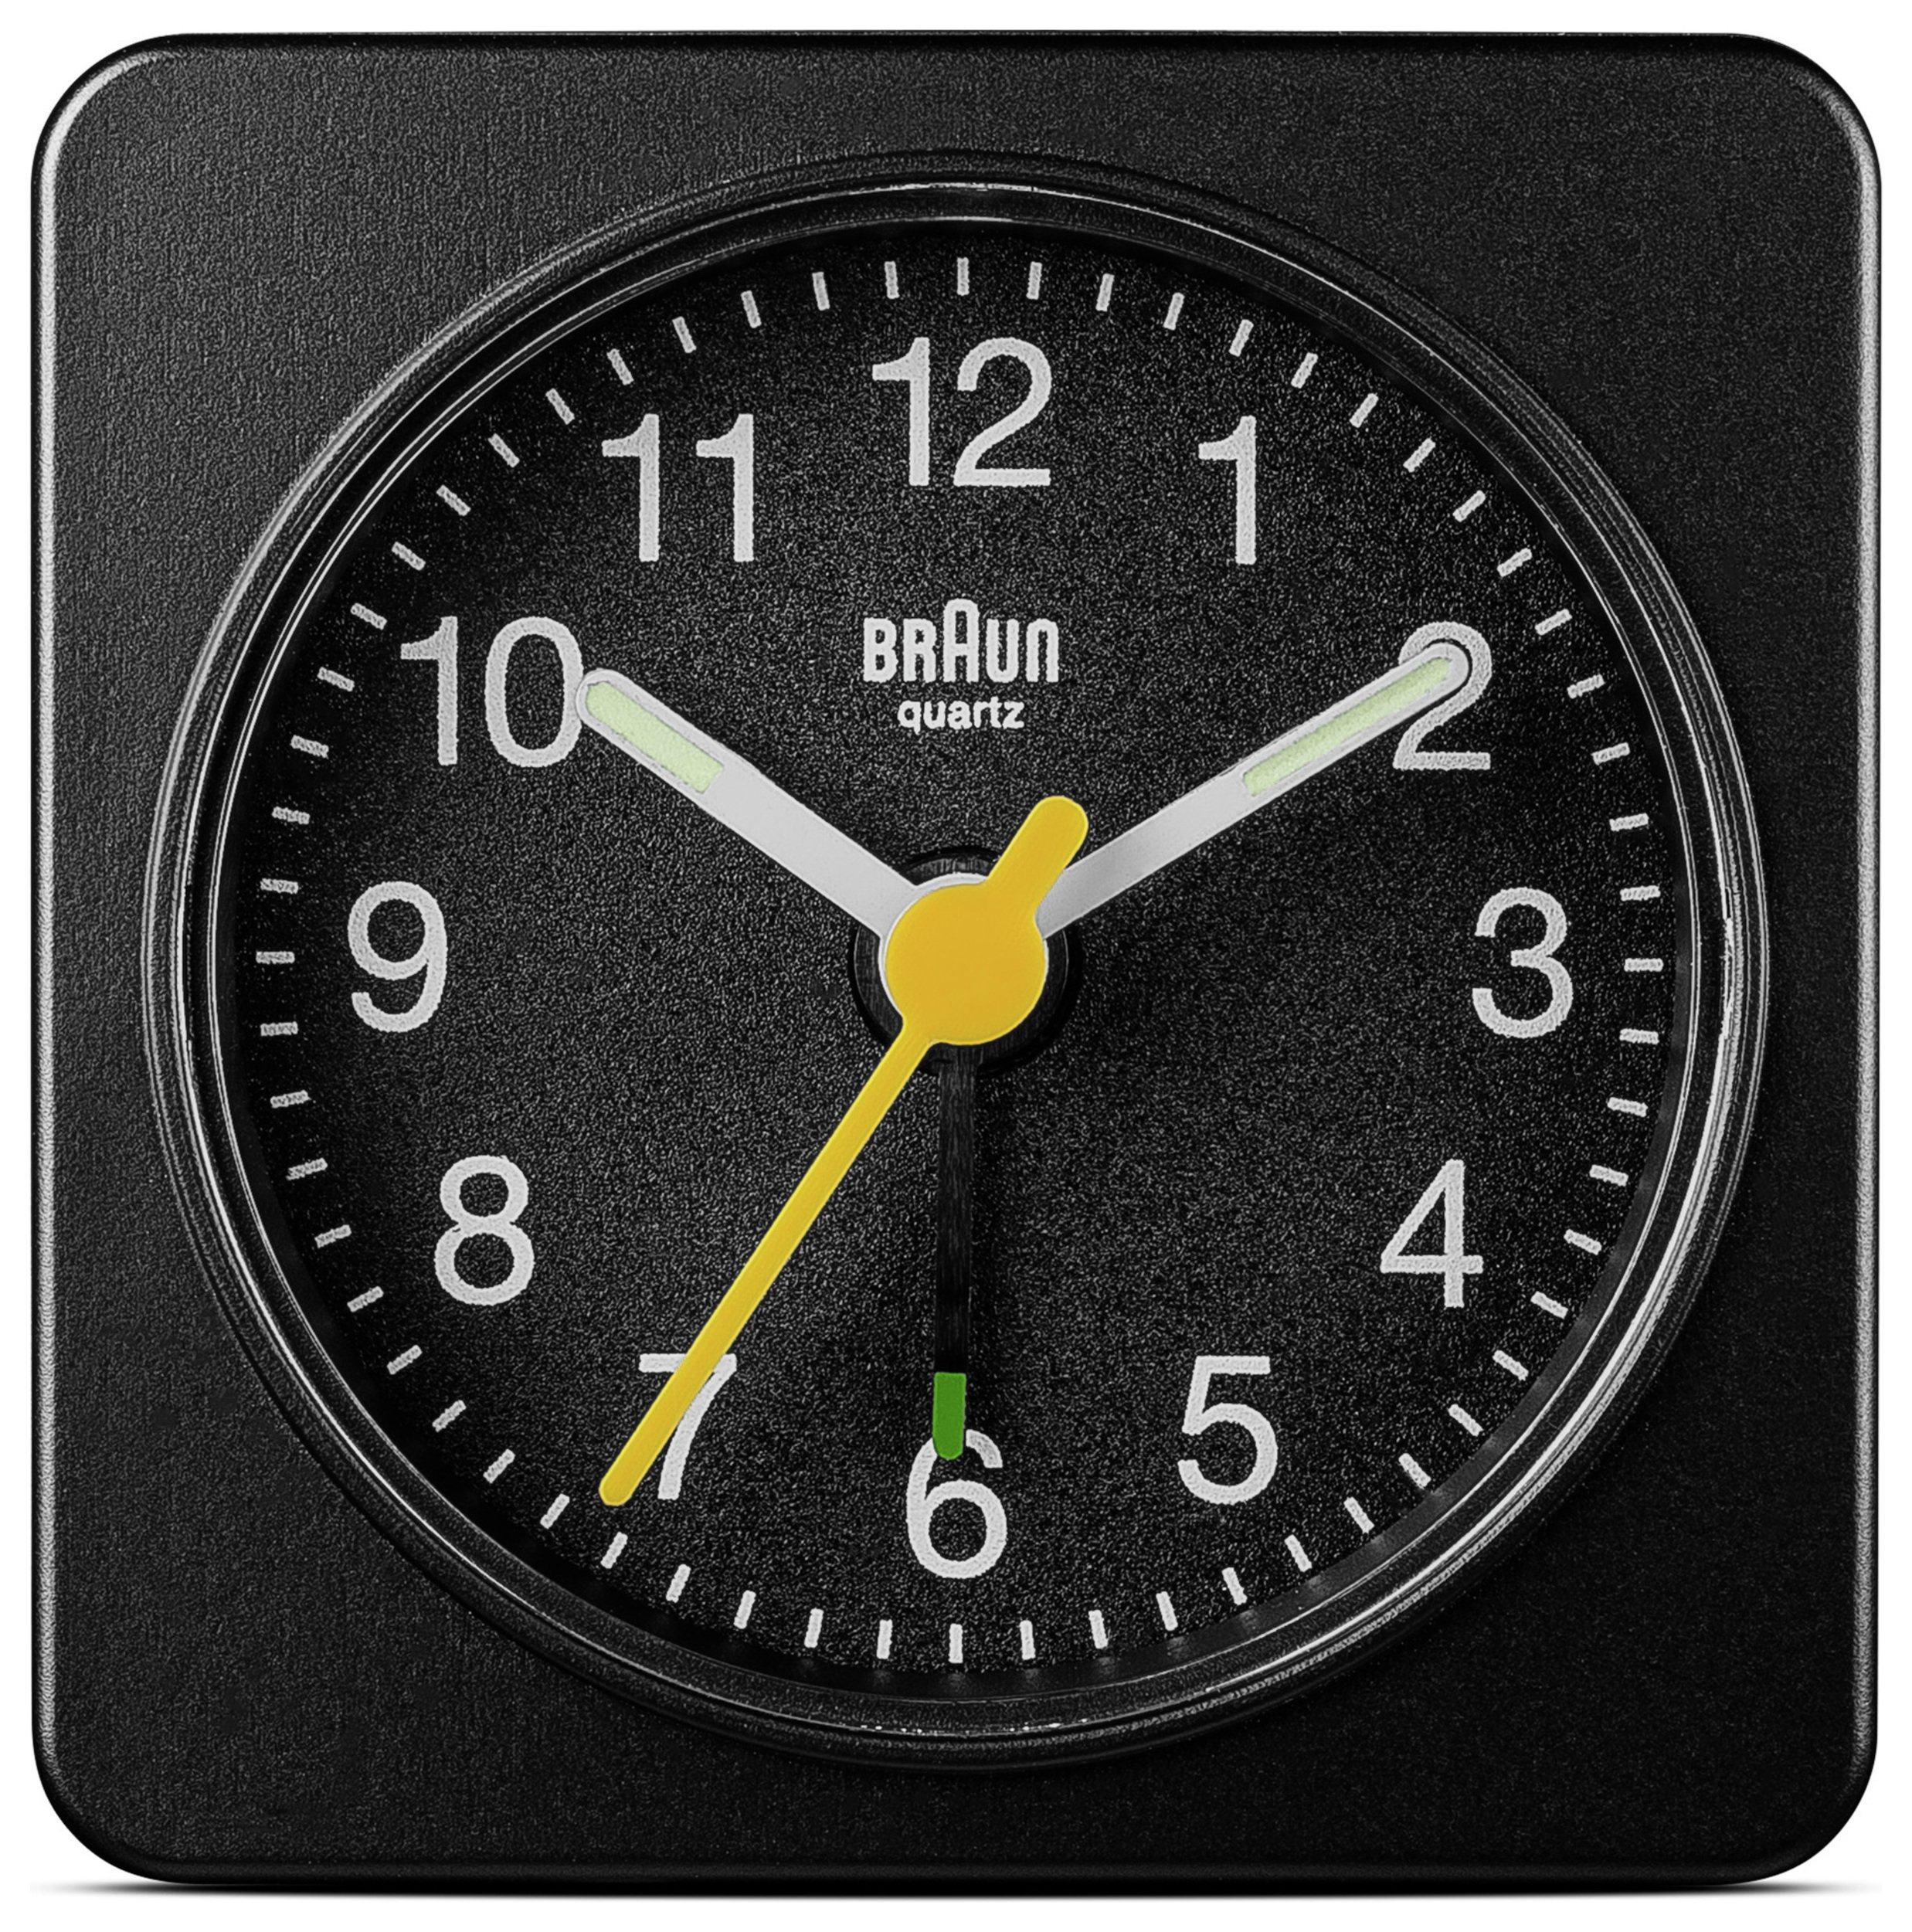 Image of Braun Analogue Travel Alarm Clock - Black